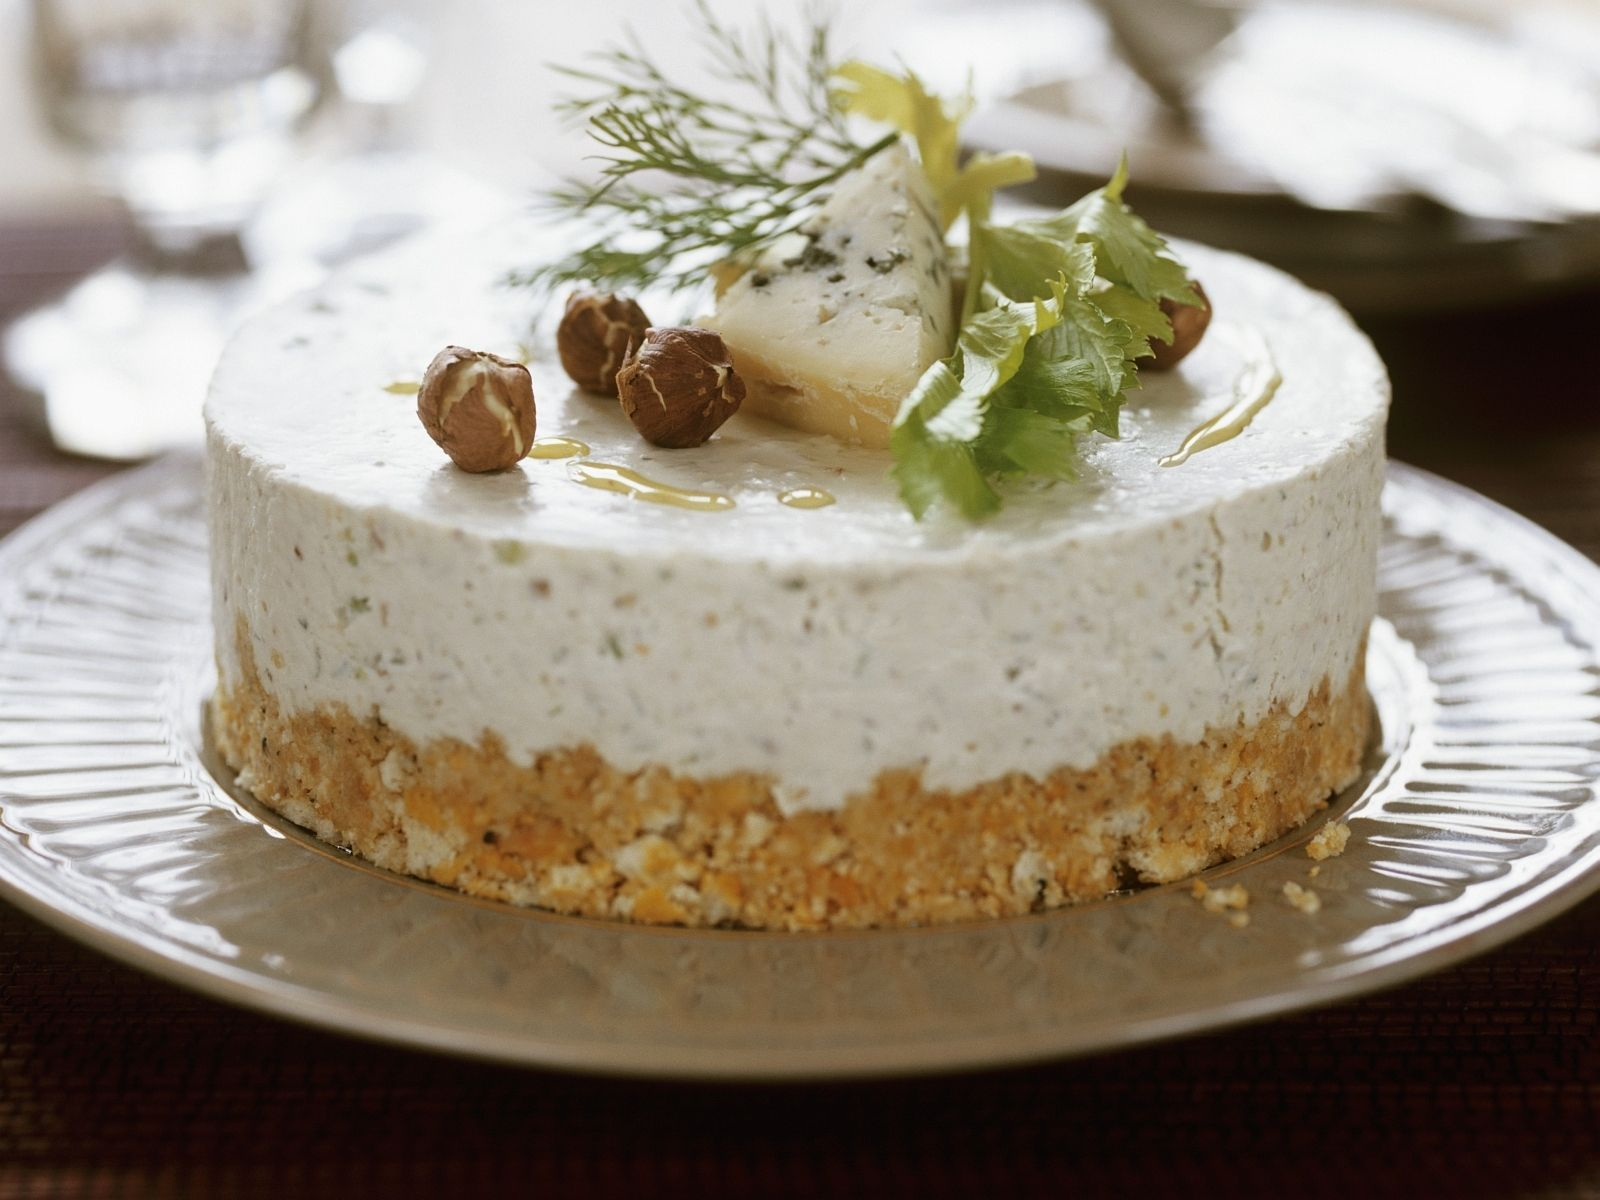 Herzhafter Fischkase Haselnuss Kuchen Rezept Eat Smarter